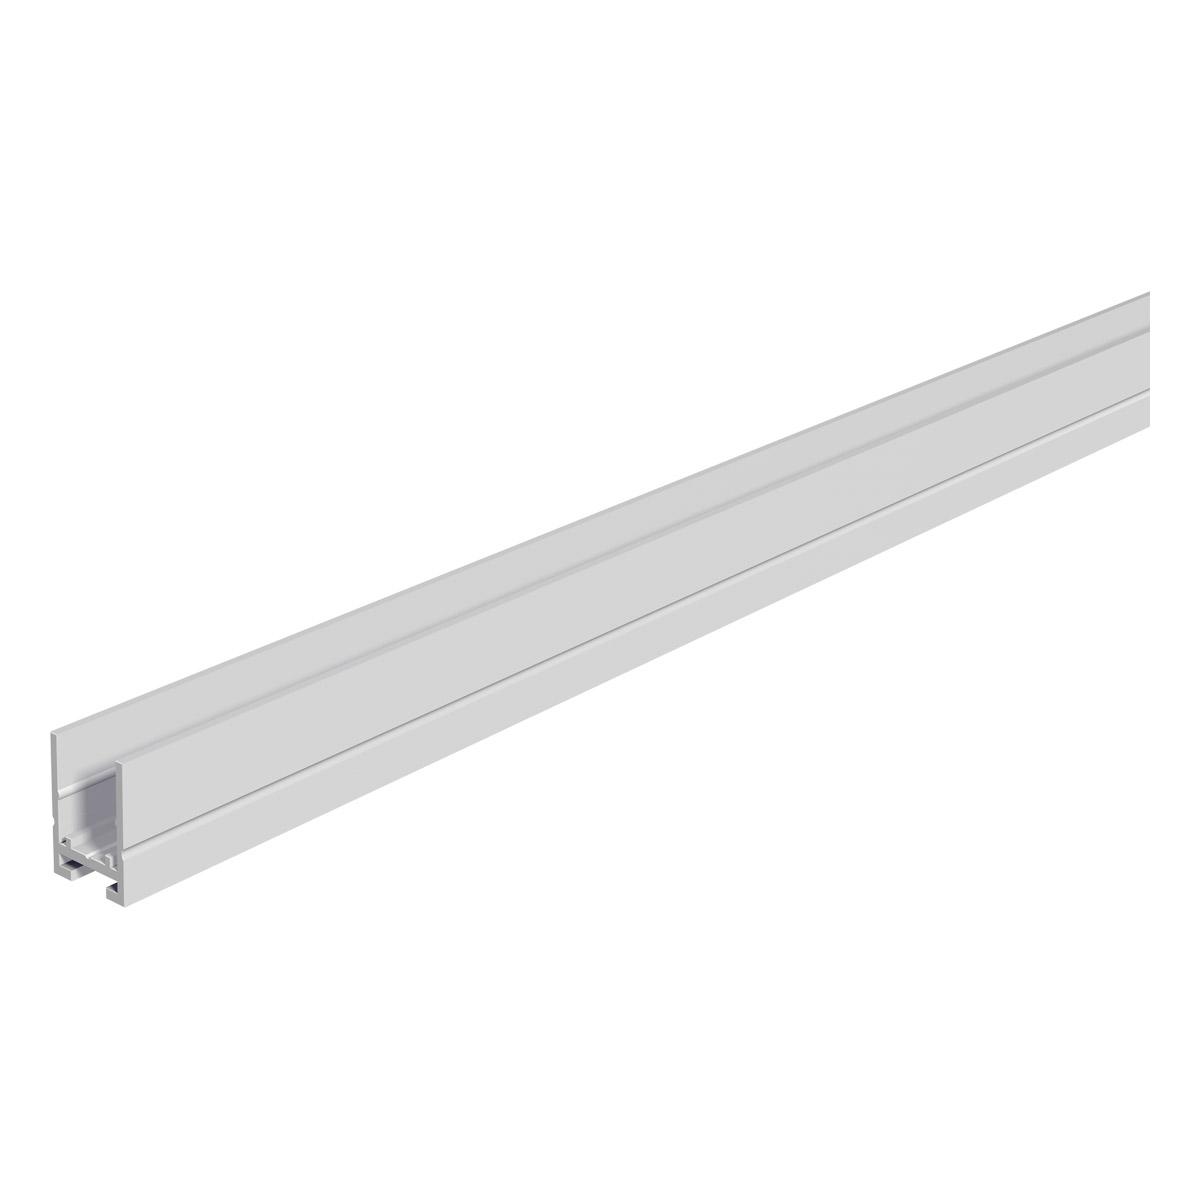 u profil f r led neon flex strip side view aluminium profil 97 5cm alu eloxiert. Black Bedroom Furniture Sets. Home Design Ideas